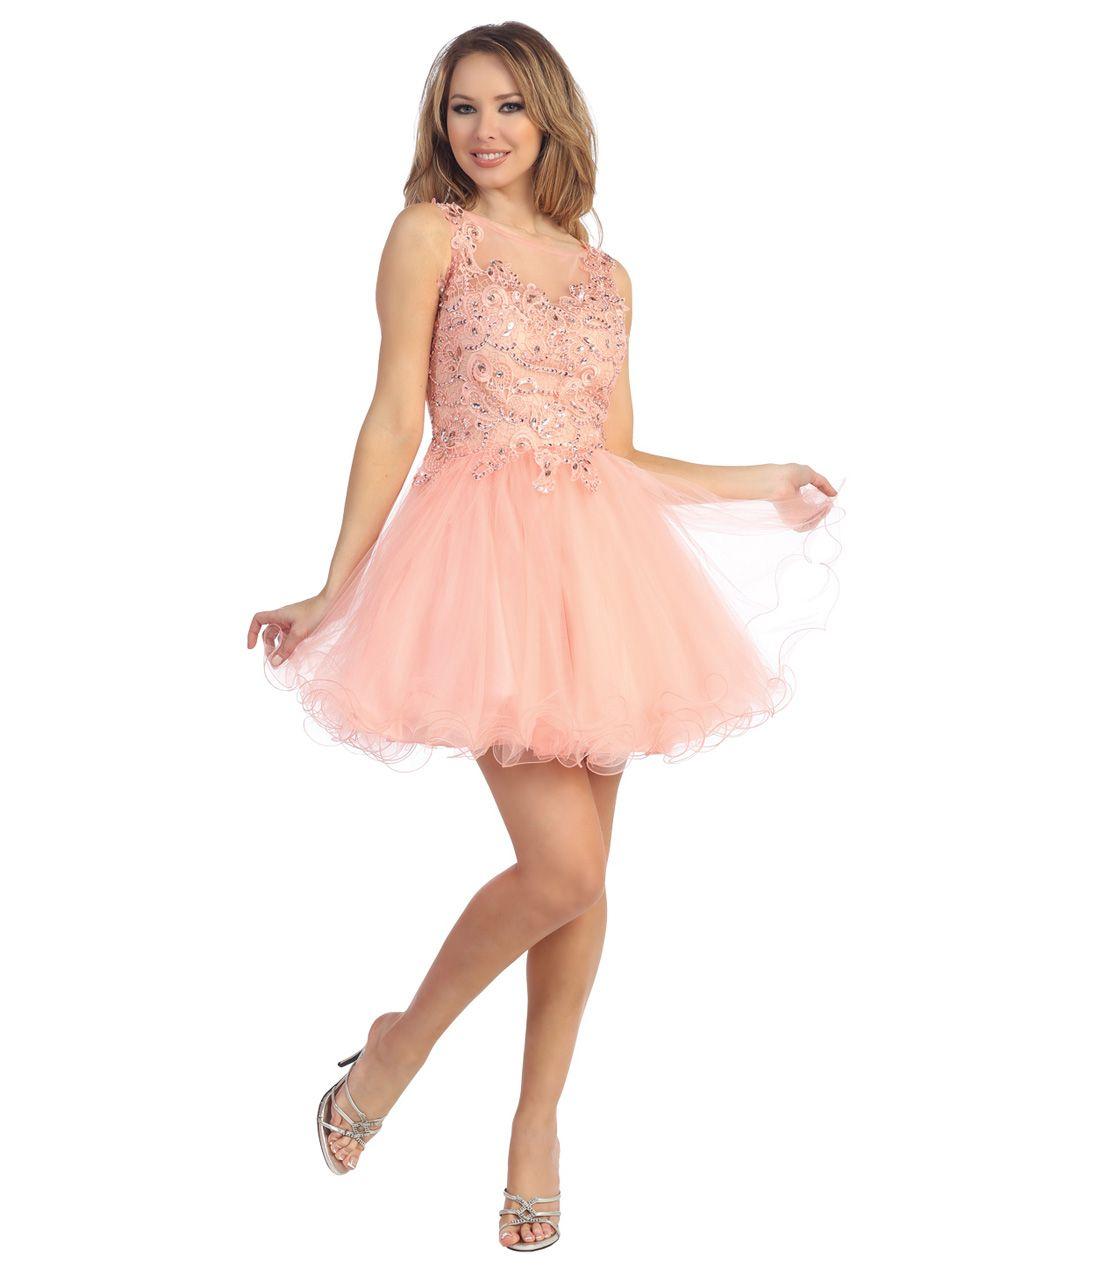 2014 Prom Dresses - Blush Peach Filigree Tulle Short Prom Dress ...